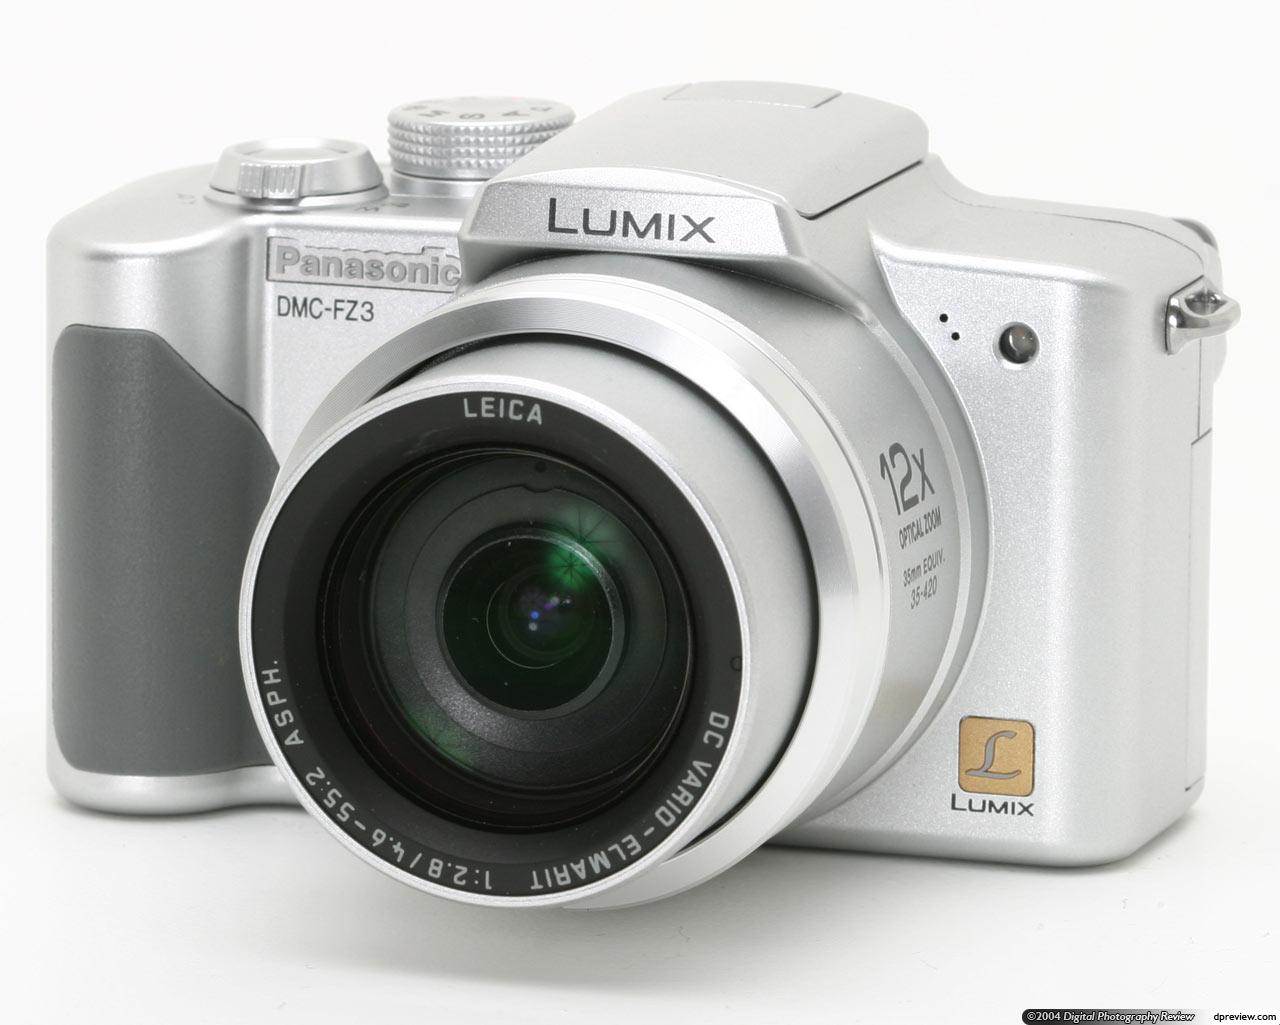 Panasonic Lumix Dmc Fz3 Battery And Charger Lumix Dmcfz3